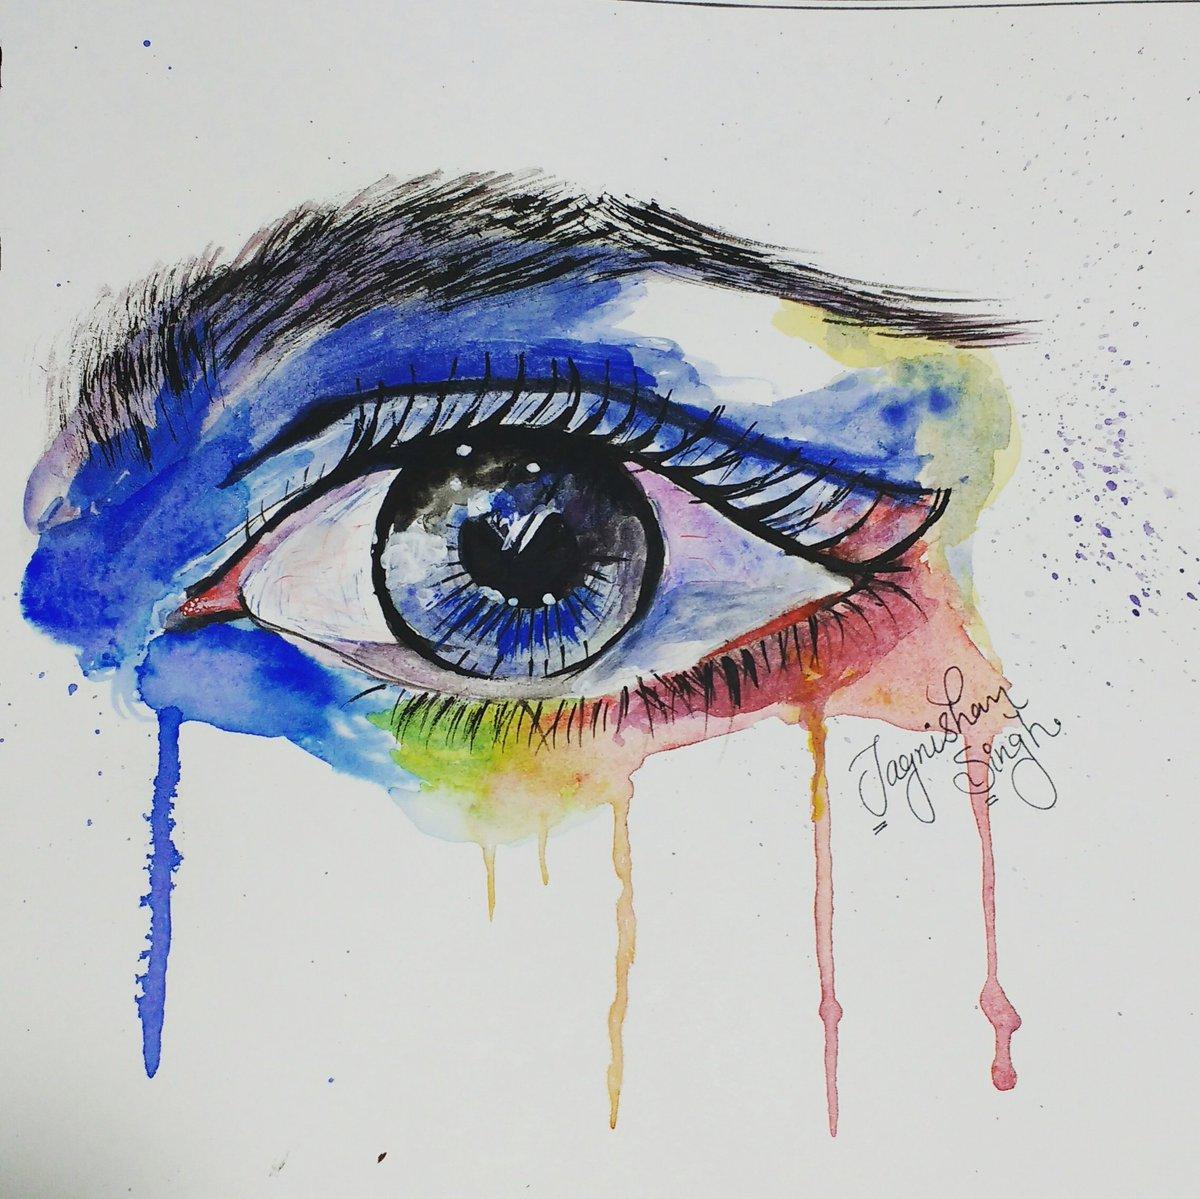 Jagnishan Singh On Twitter Eye Sad Love Share Drawings Art